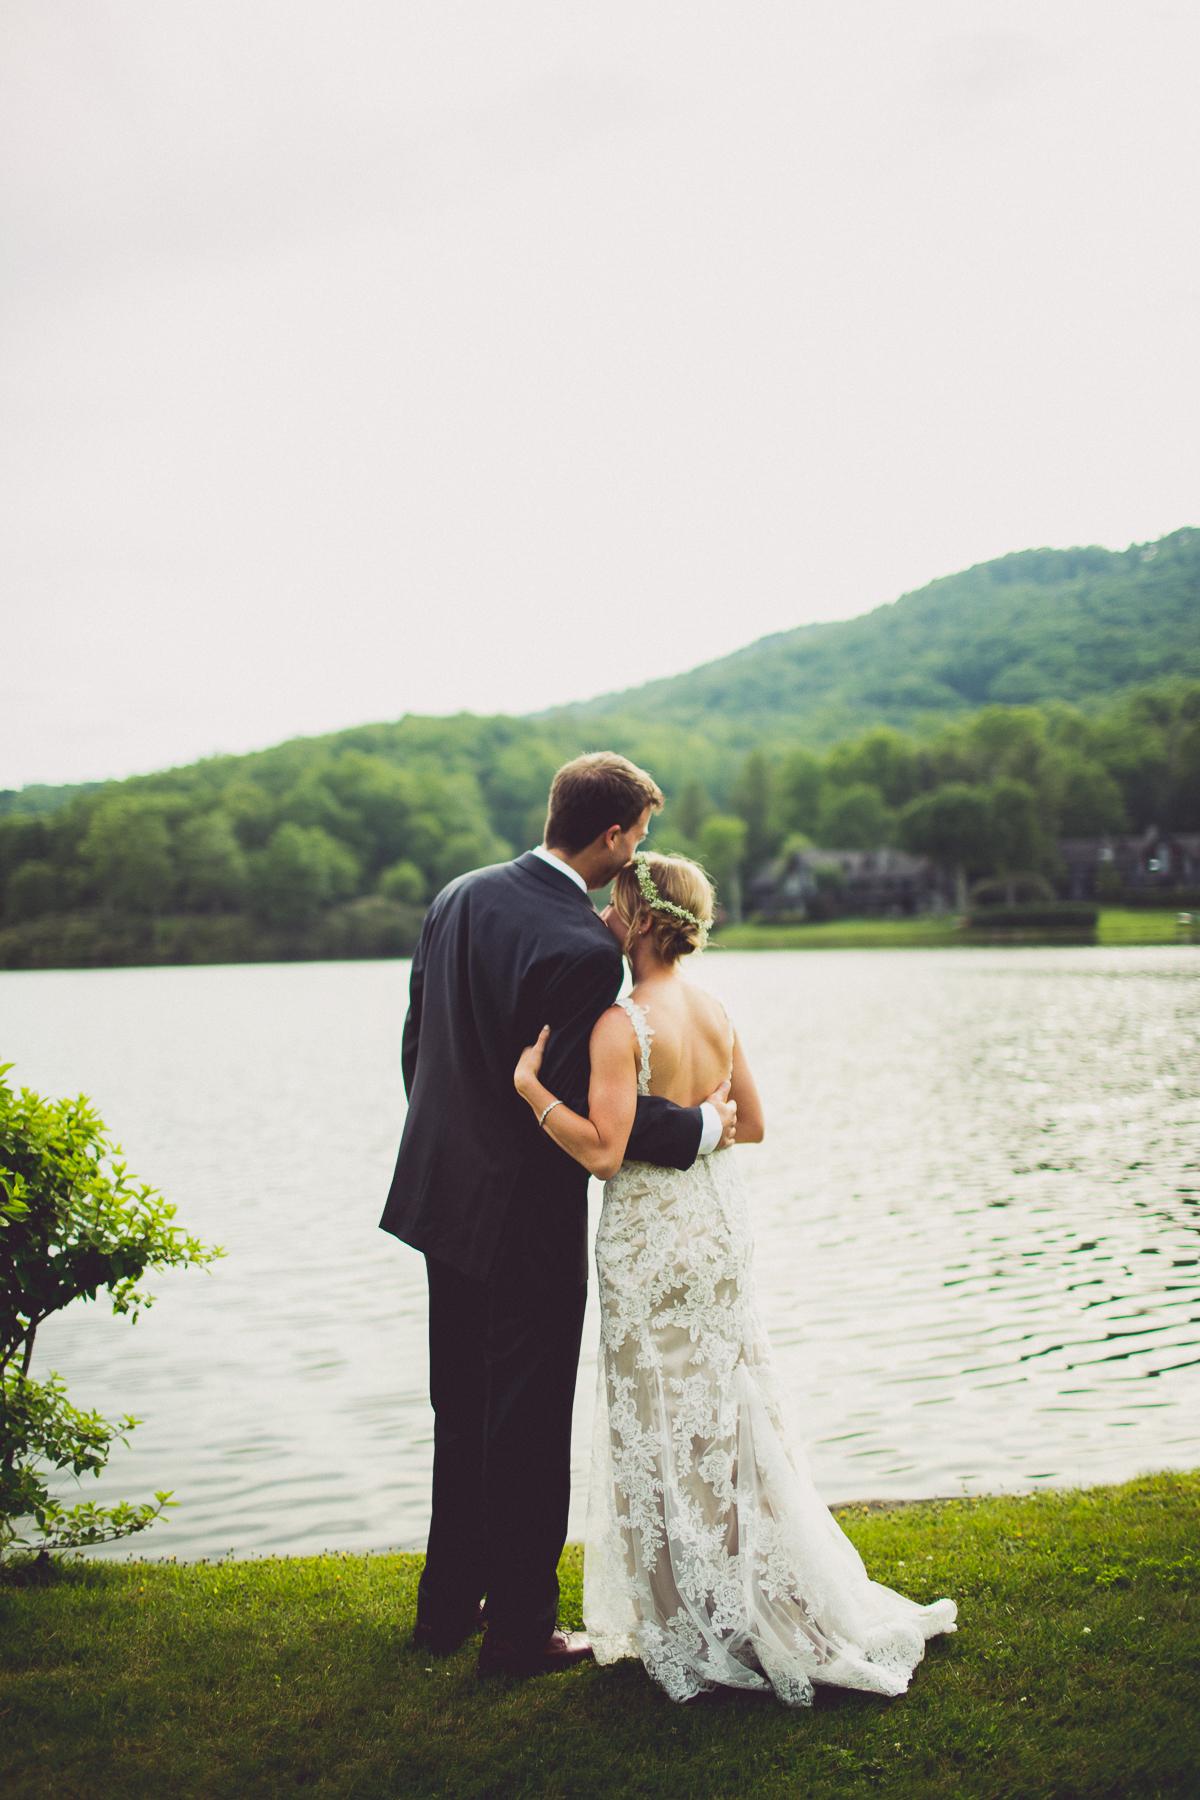 taylor-travis-grandfather-mountain-kelley-raye-north-carolina-wedding-photographer-96.jpg